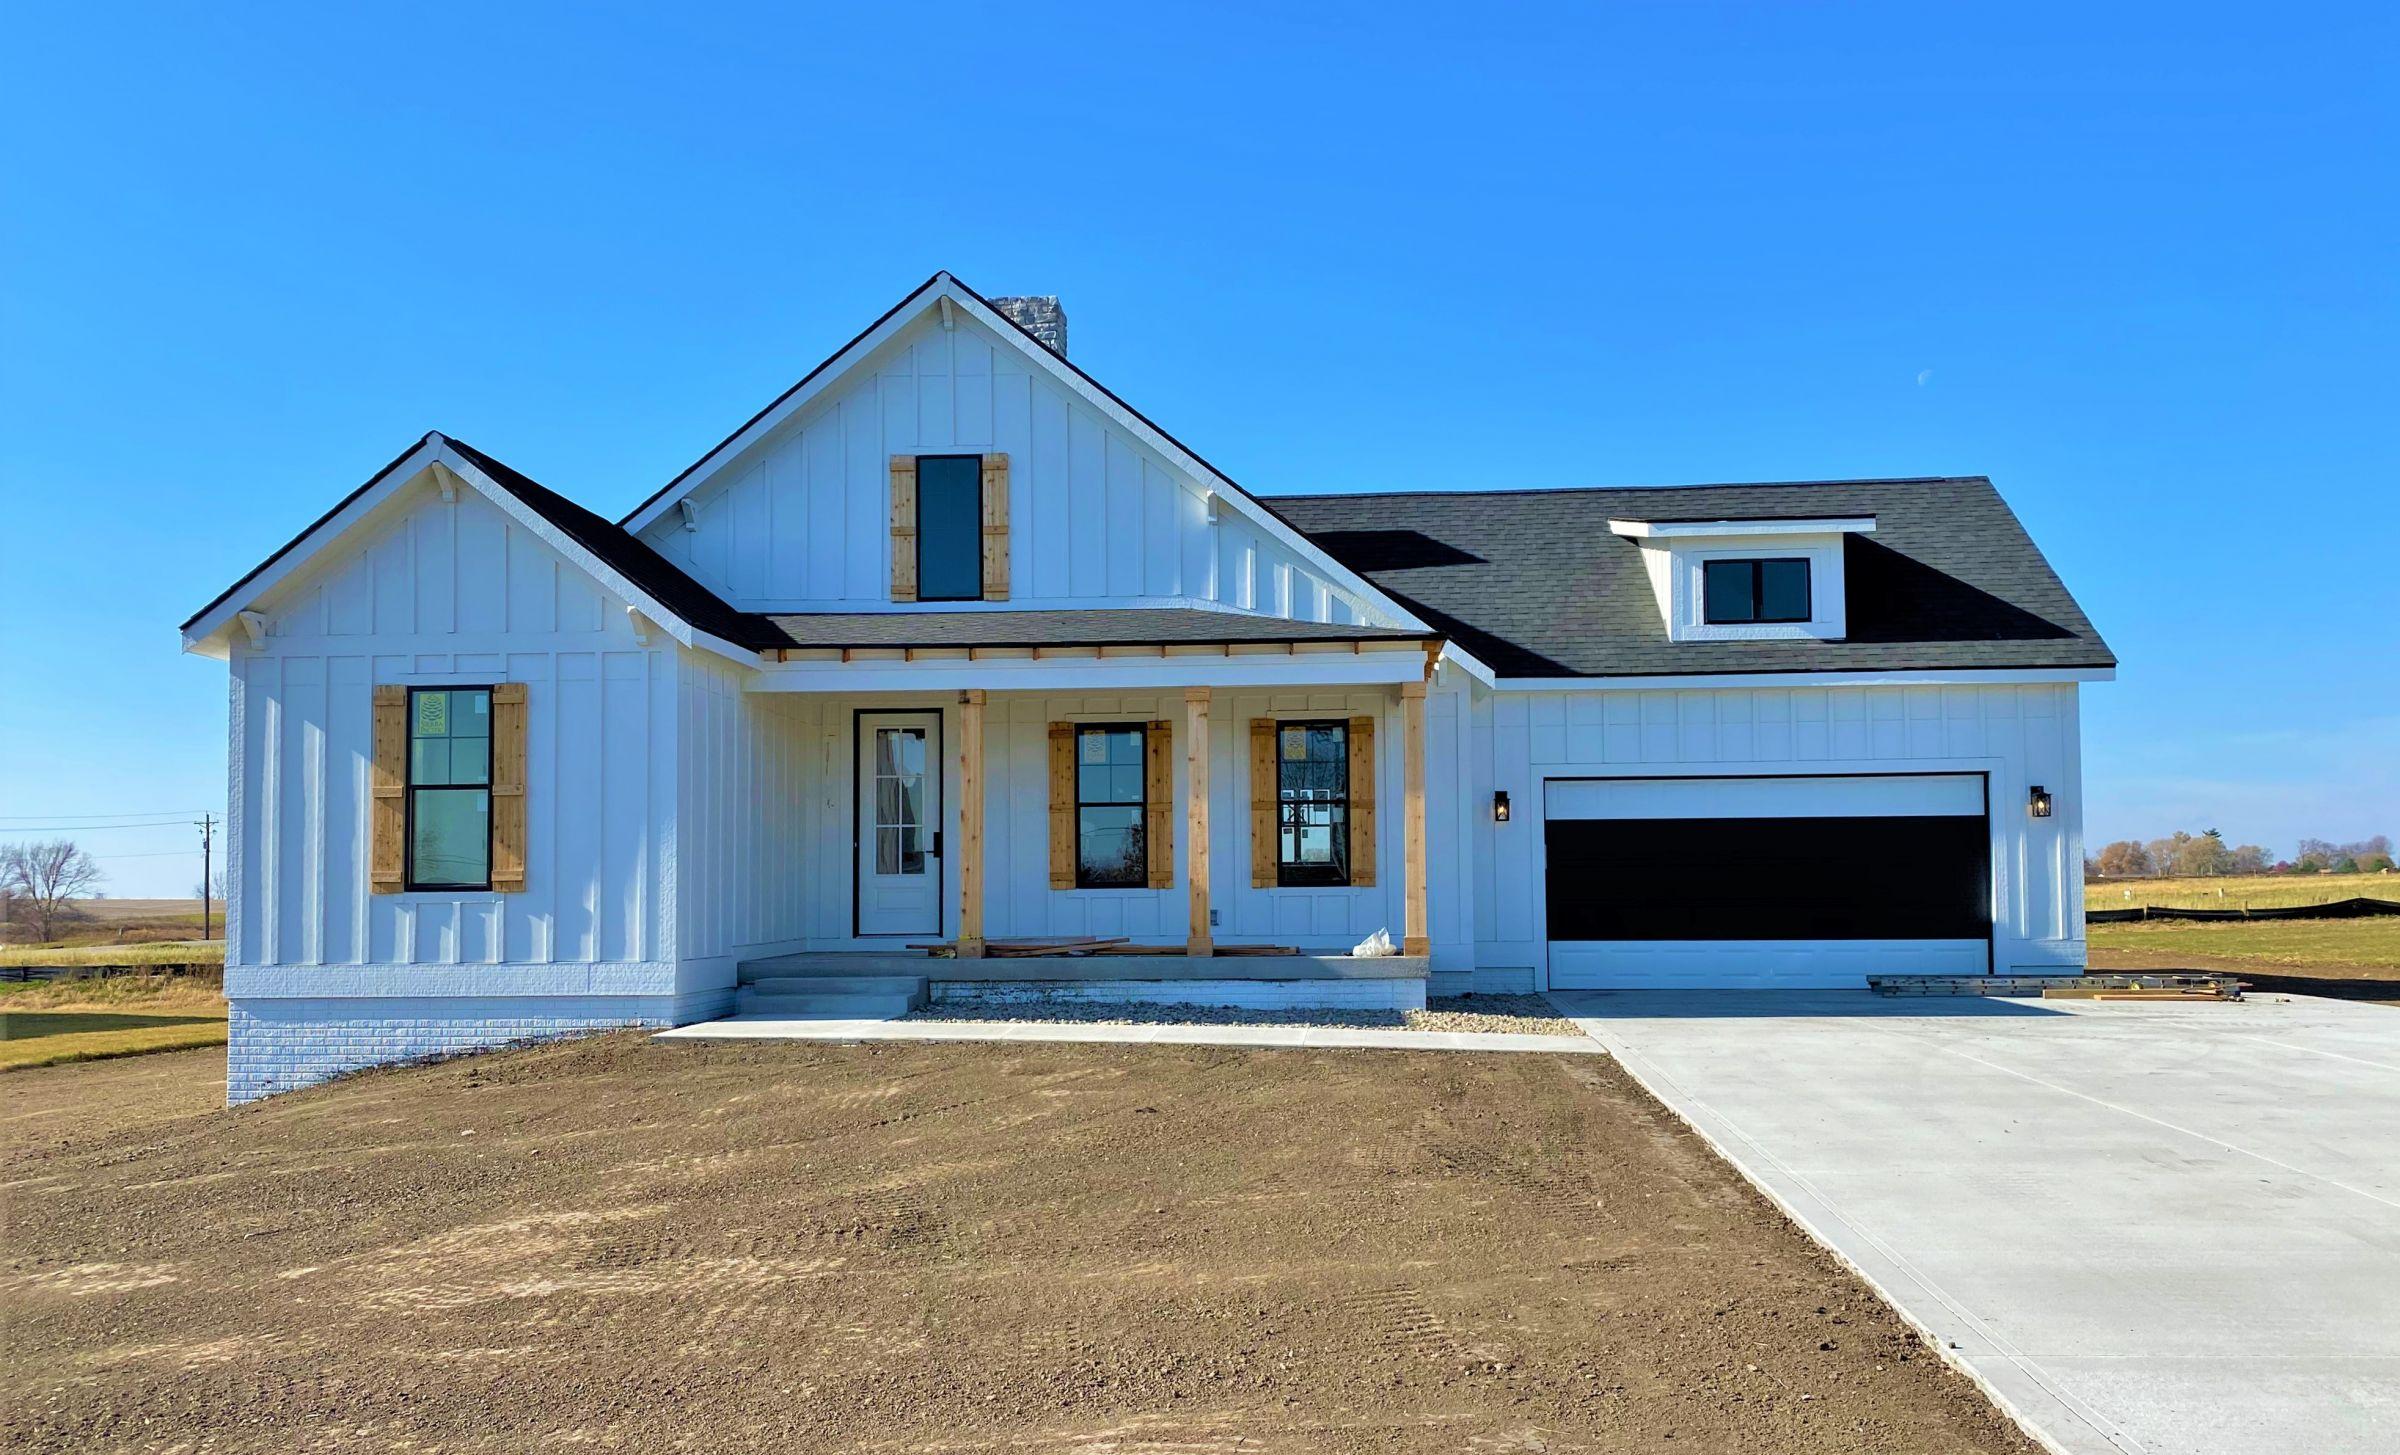 residential-warren-county-iowa-1-acres-listing-number-15096-0-2020-11-11-180211.jpg